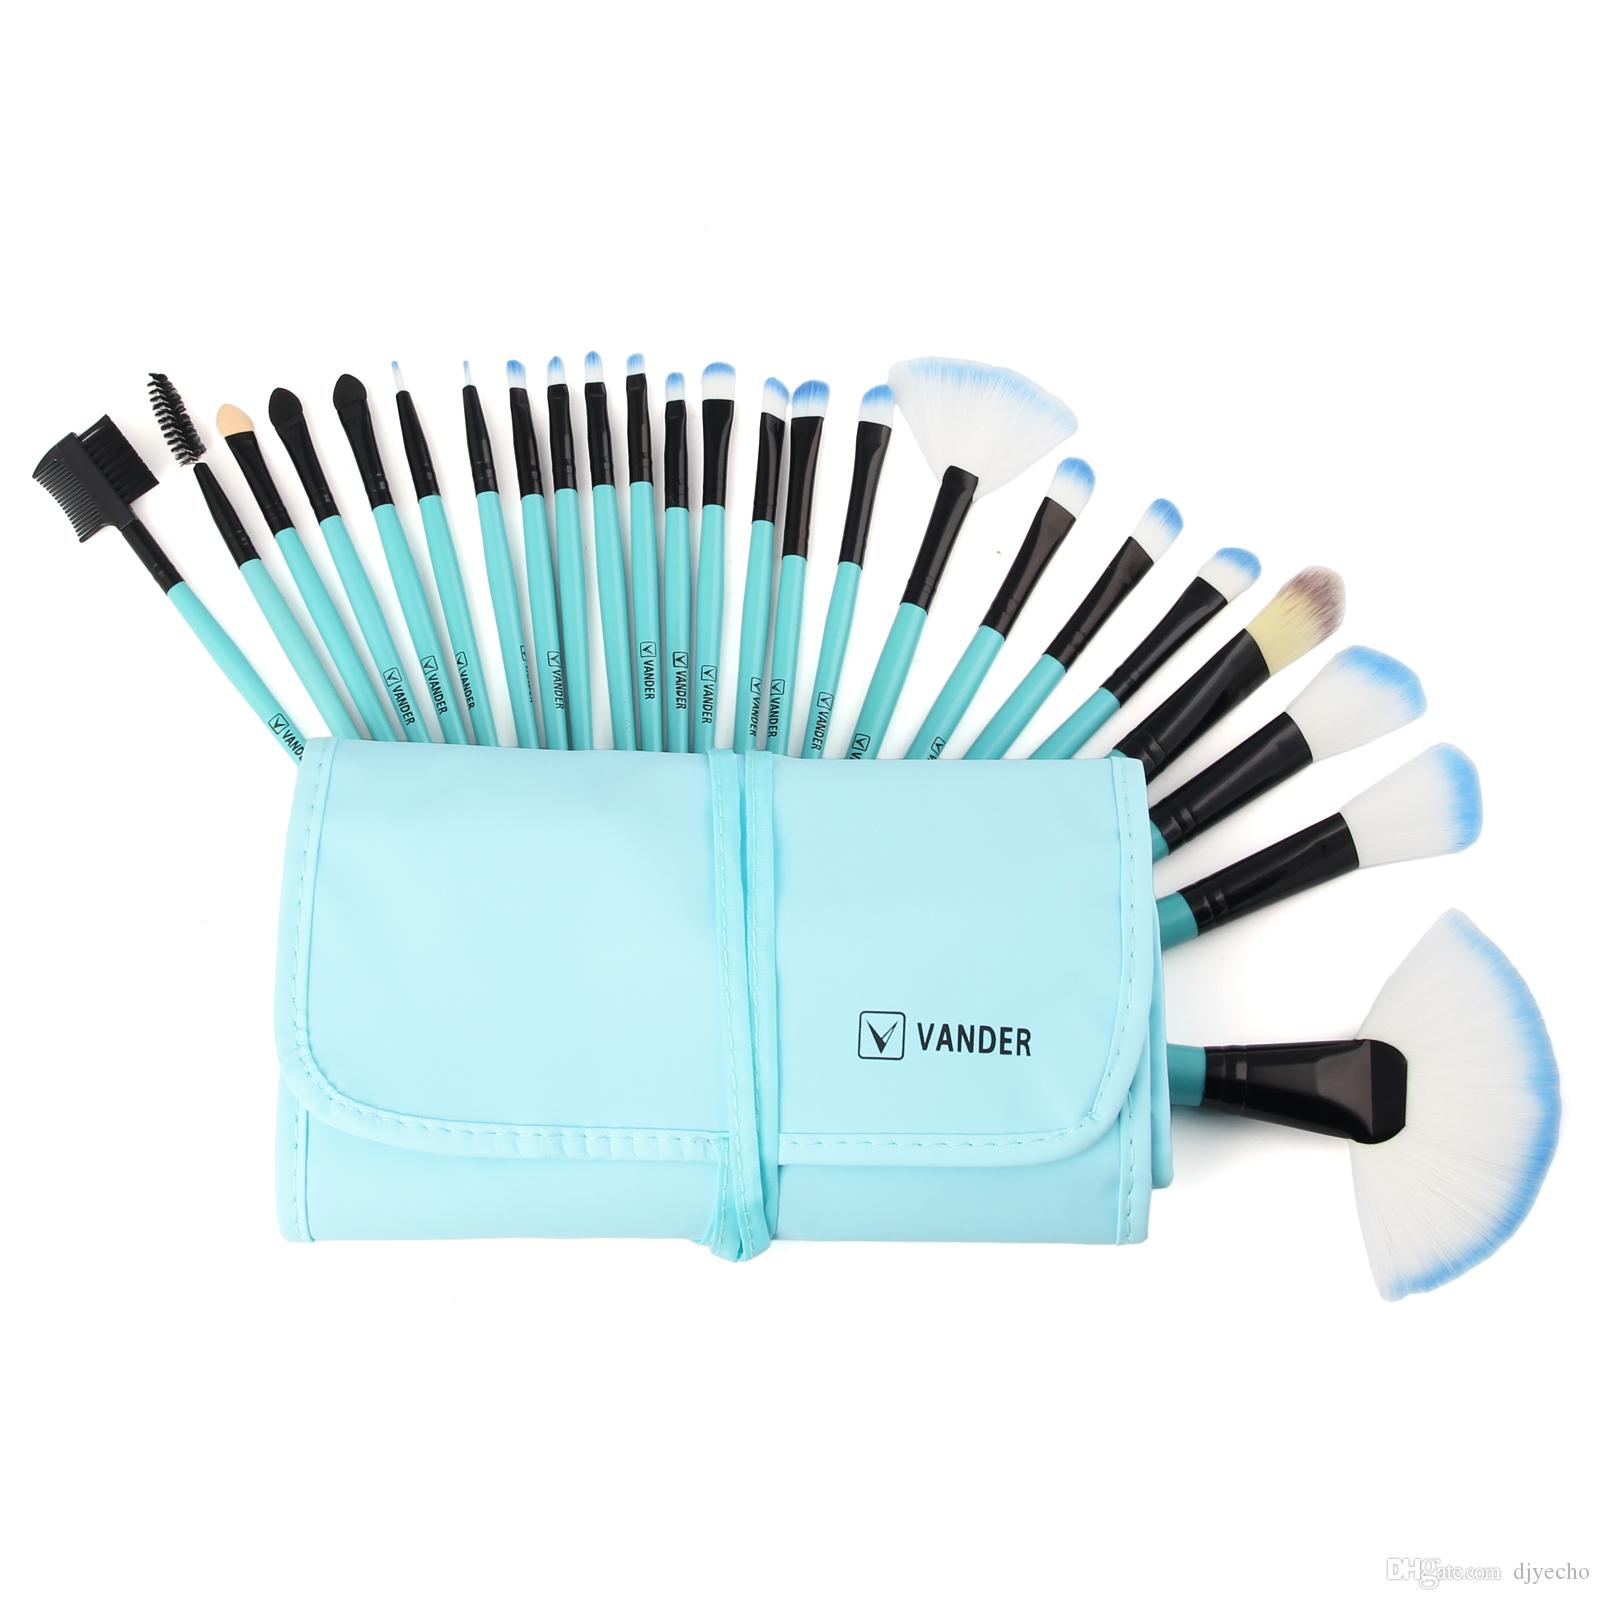 VanderLife Pro Maquillage Brosses À Brosser Ensemble 24pcs / lot Bleu Pinsel Cosmétique Fondation Poudre Blush Eyeliner Blending Brushes Kit Avec Sac